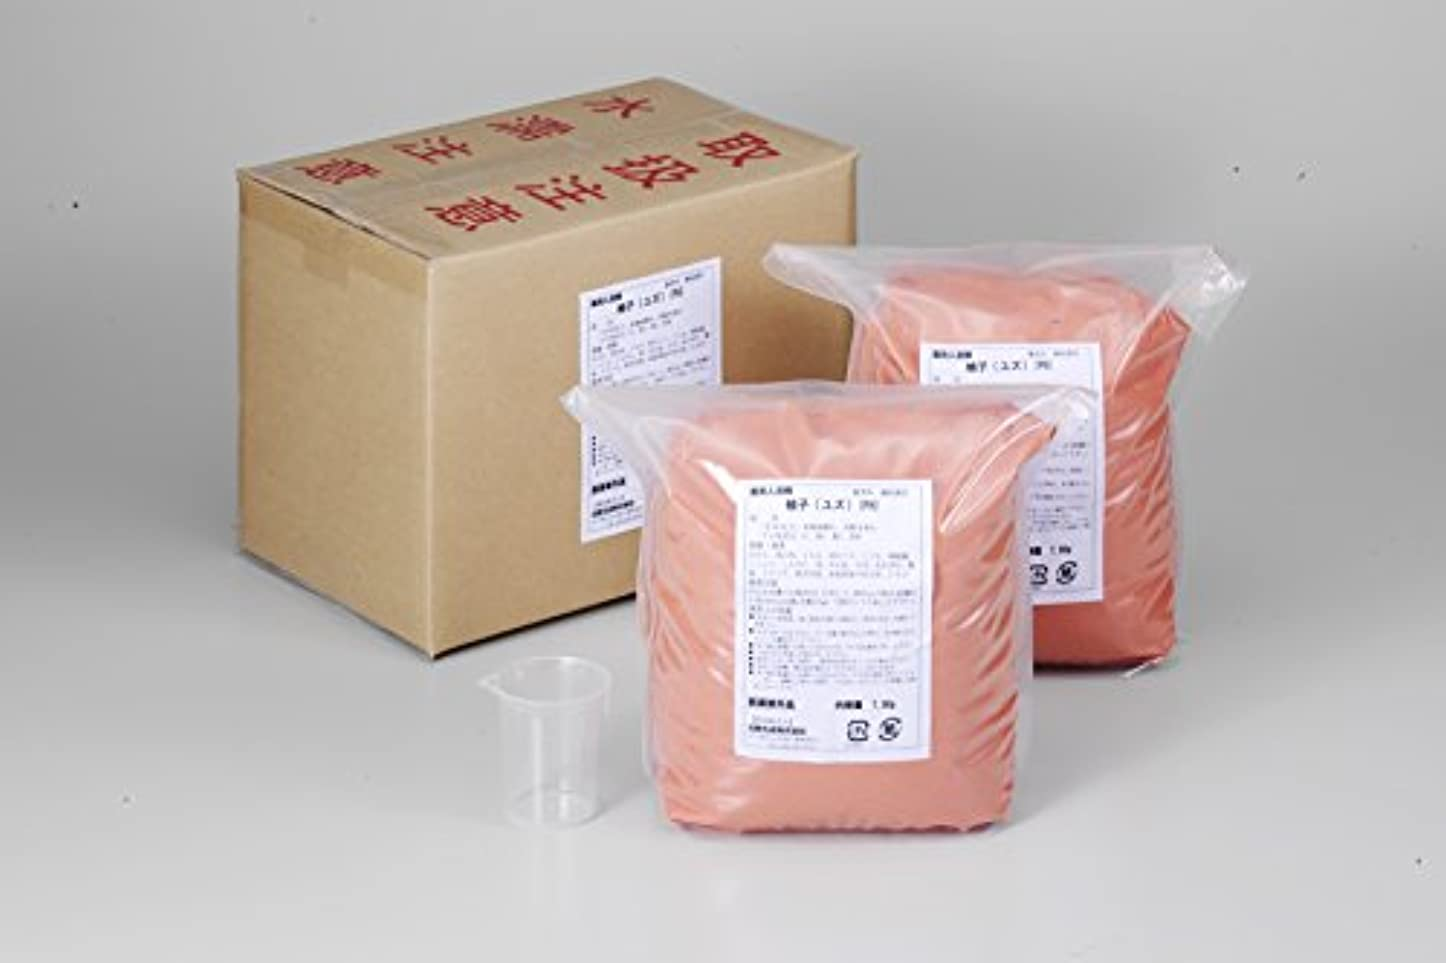 時制国湿地業務用入浴剤「ユズ」15kg(7.5kg×2)